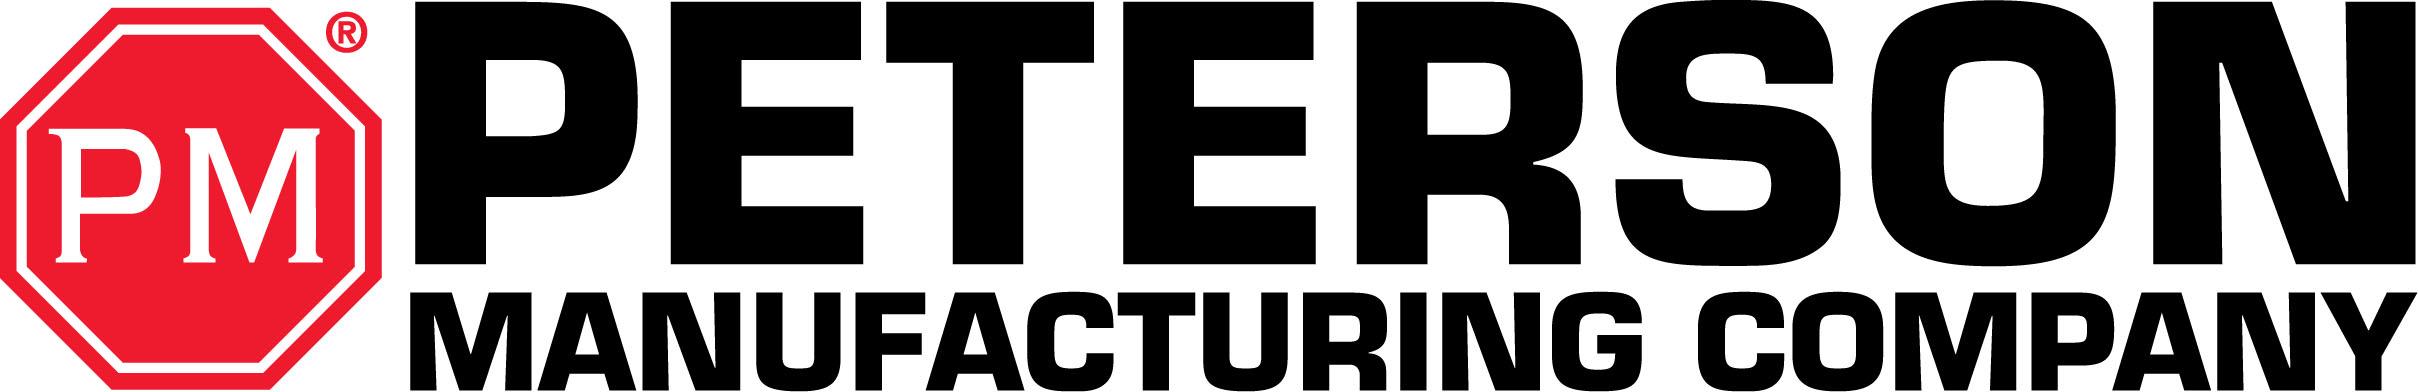 Peterson Manufacturing Earns Prestigious National Honor  Peterson Manufa...